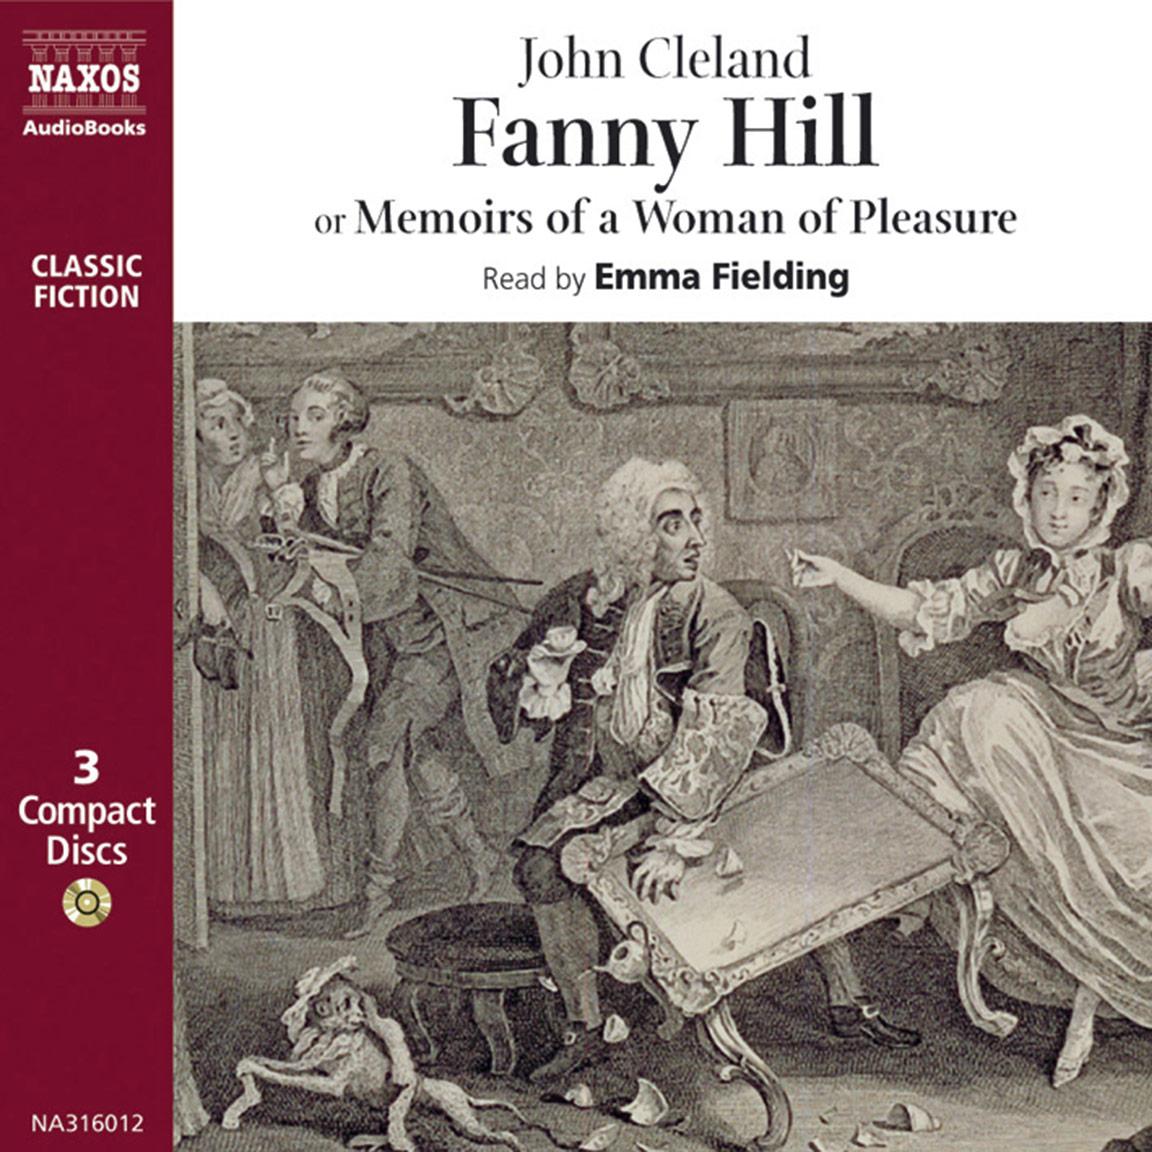 Fanny Hill (abridged)